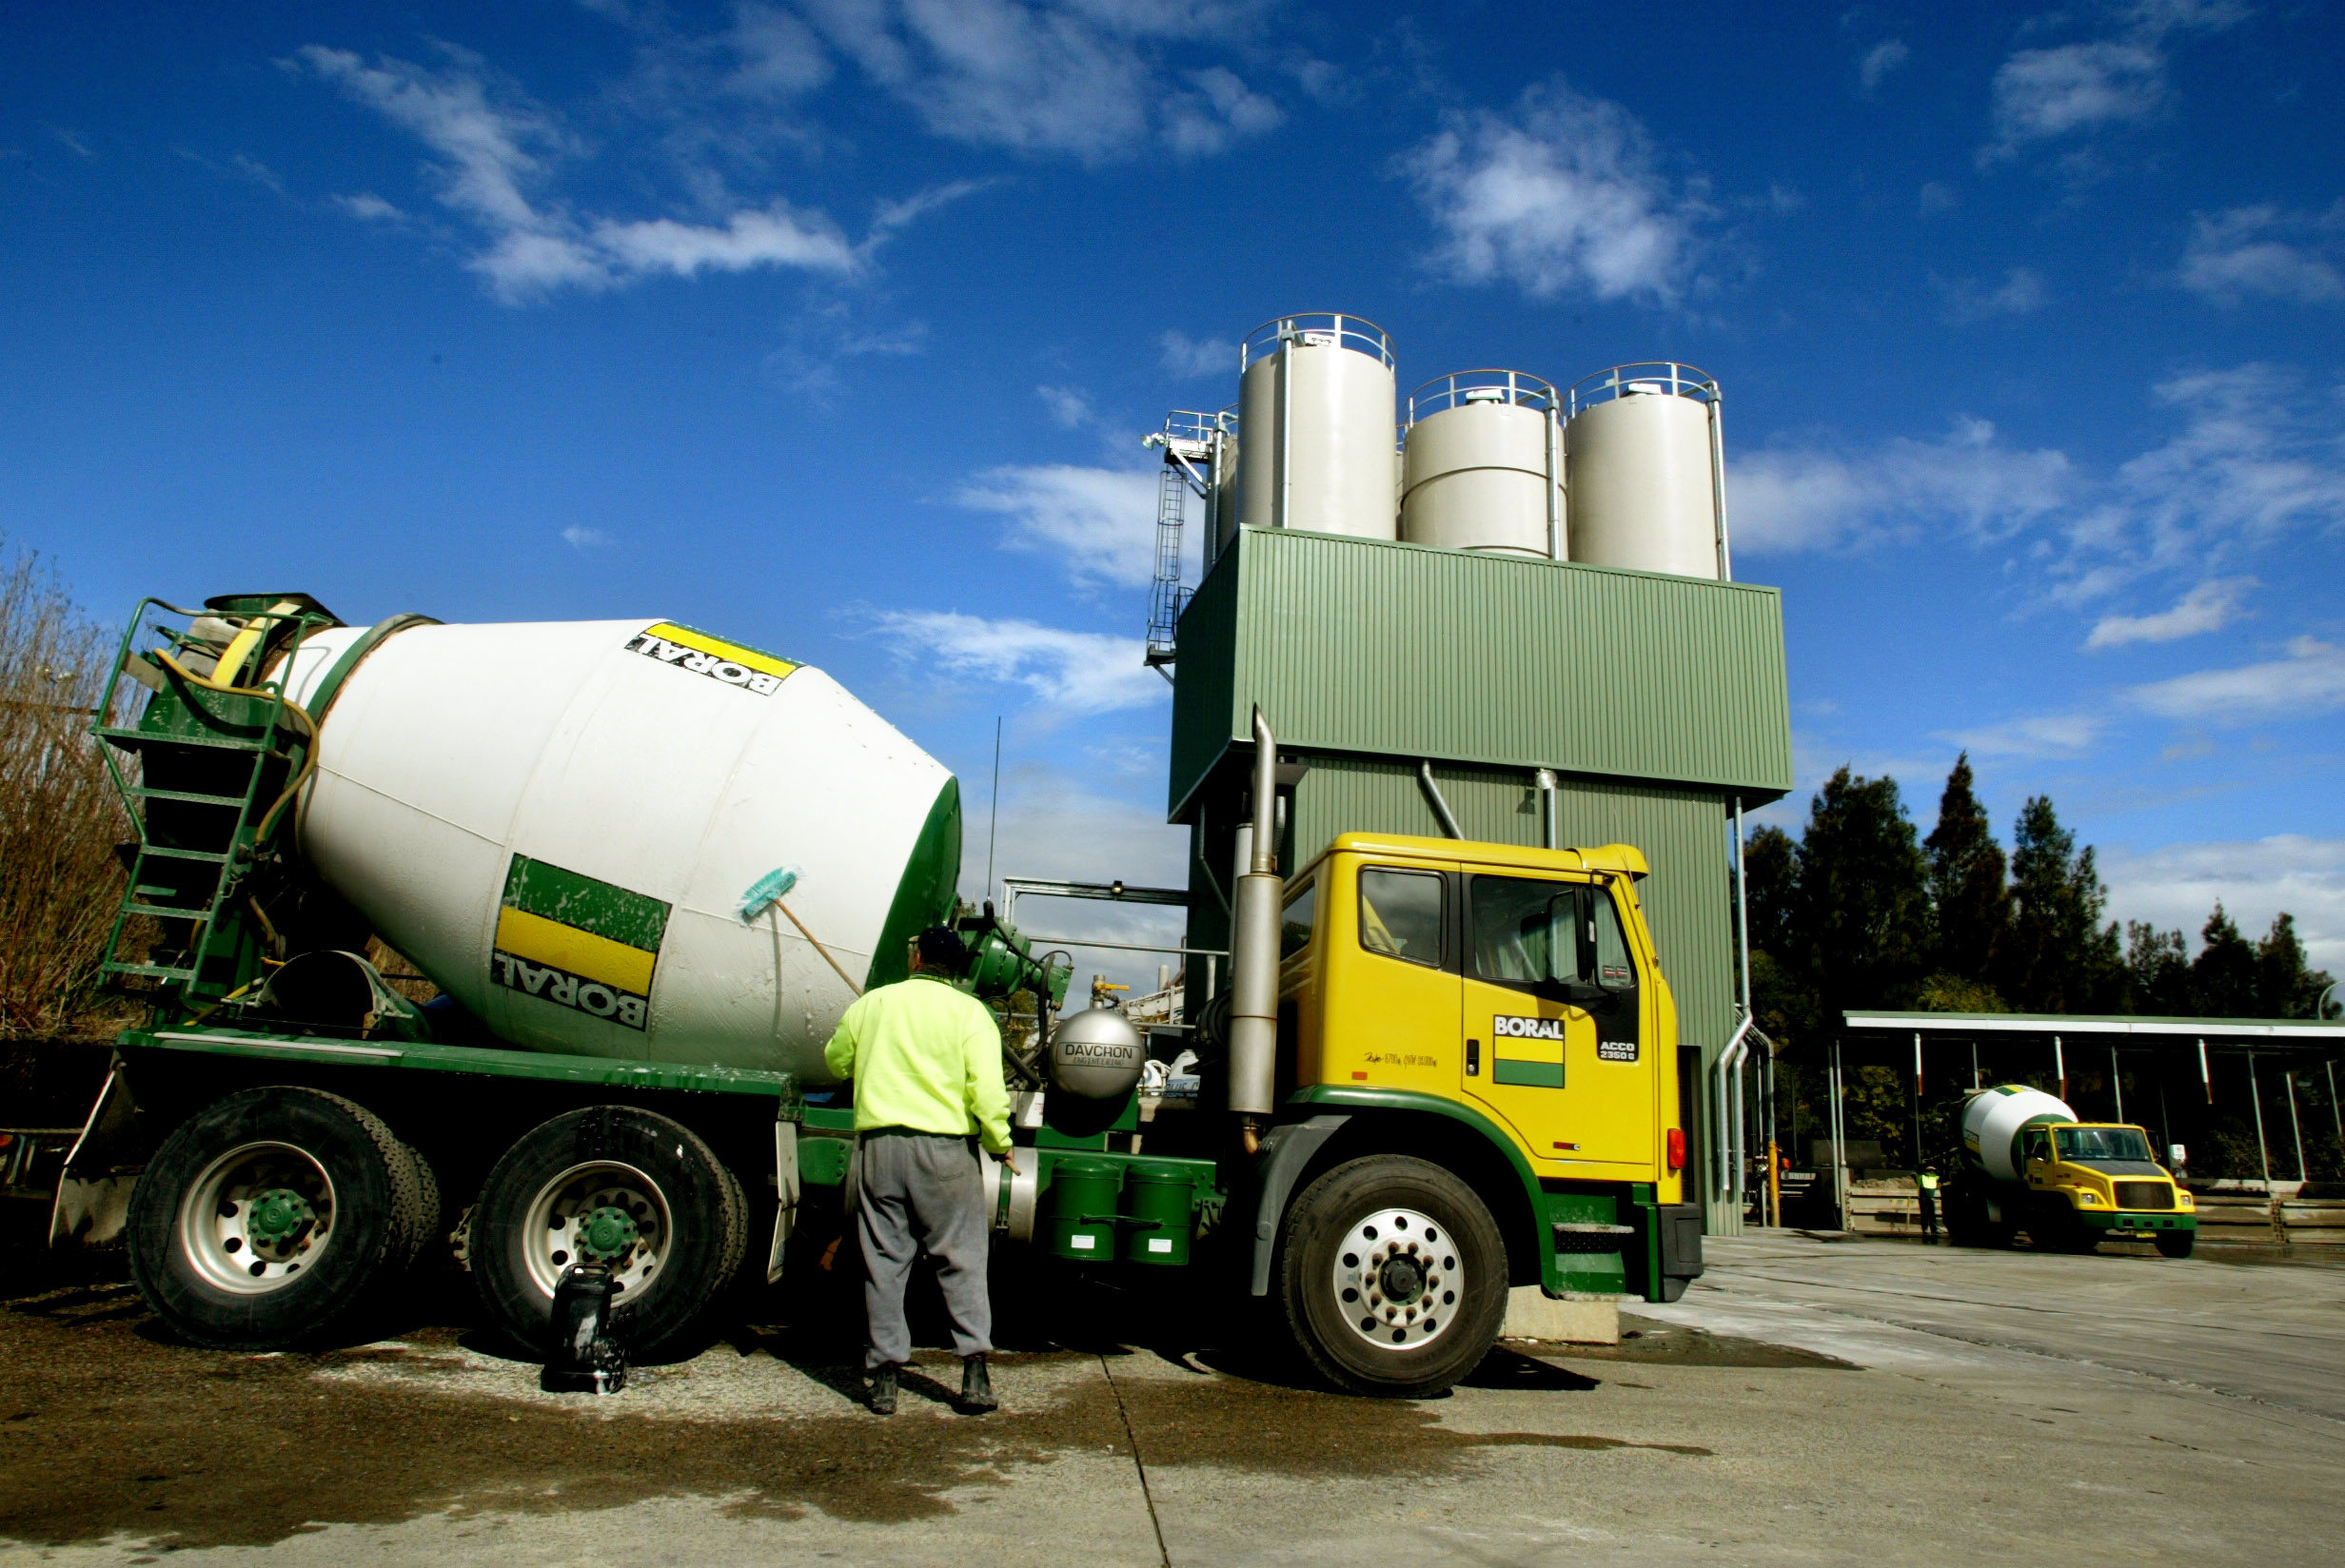 Boral Cement in Chullora, Australia, on August 17, 2004.